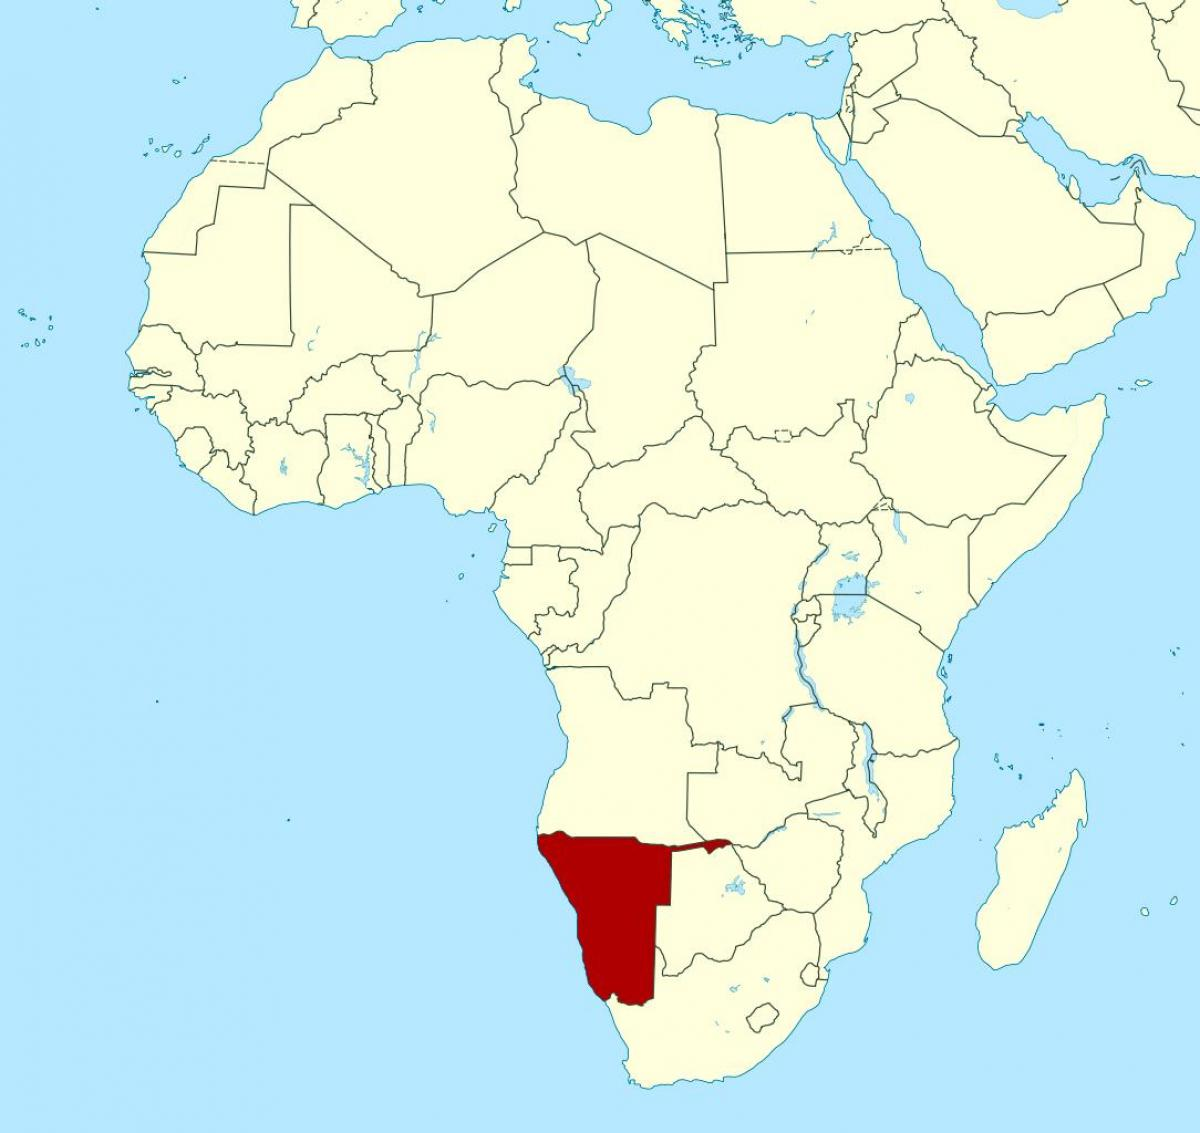 Namibia Kartta Afrikan Kartta Namibia Afrikka Etela Afrikka